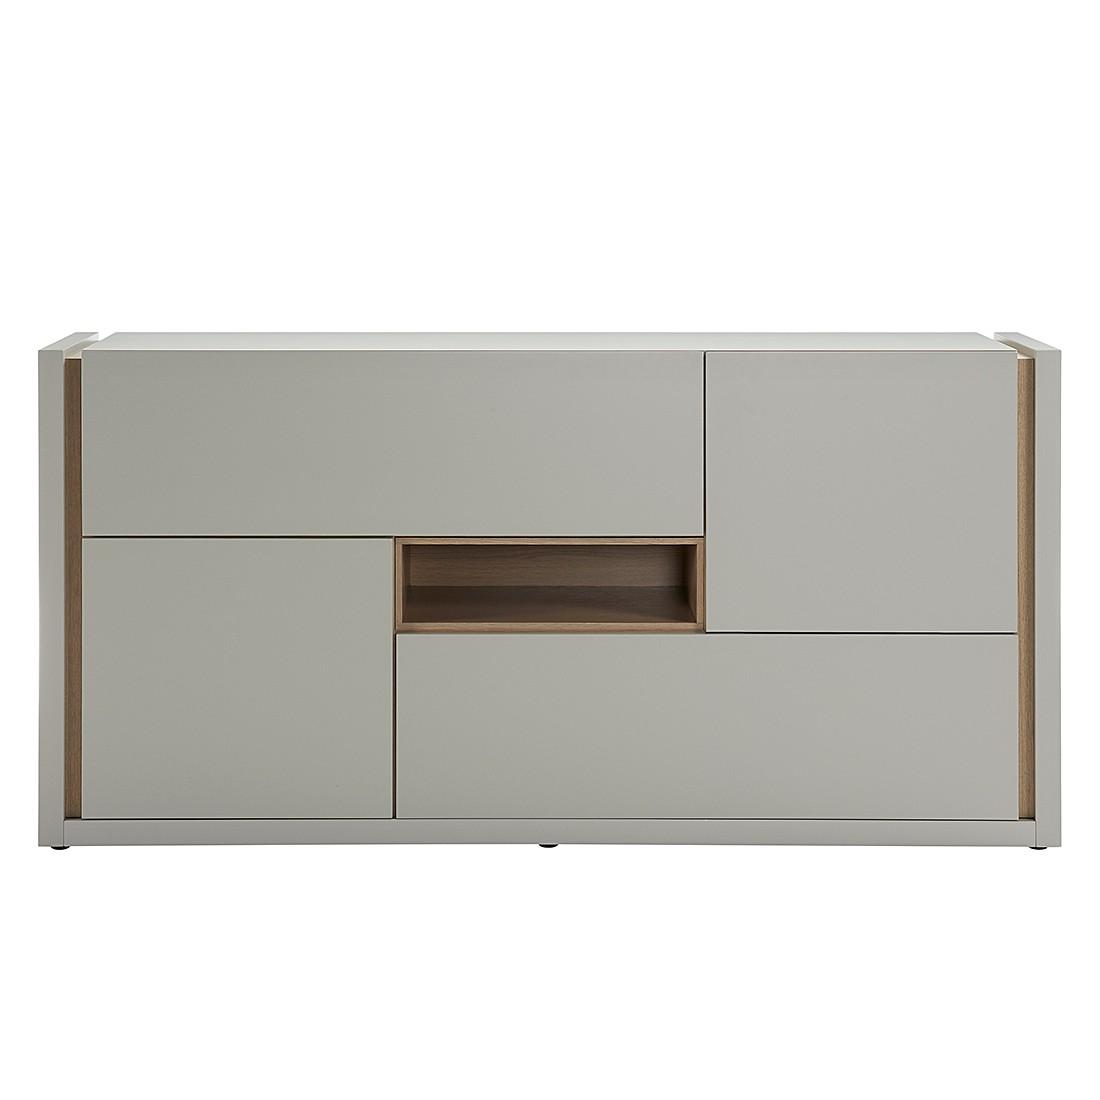 sideboard thule ii matt grau loftscape m ju 000123. Black Bedroom Furniture Sets. Home Design Ideas